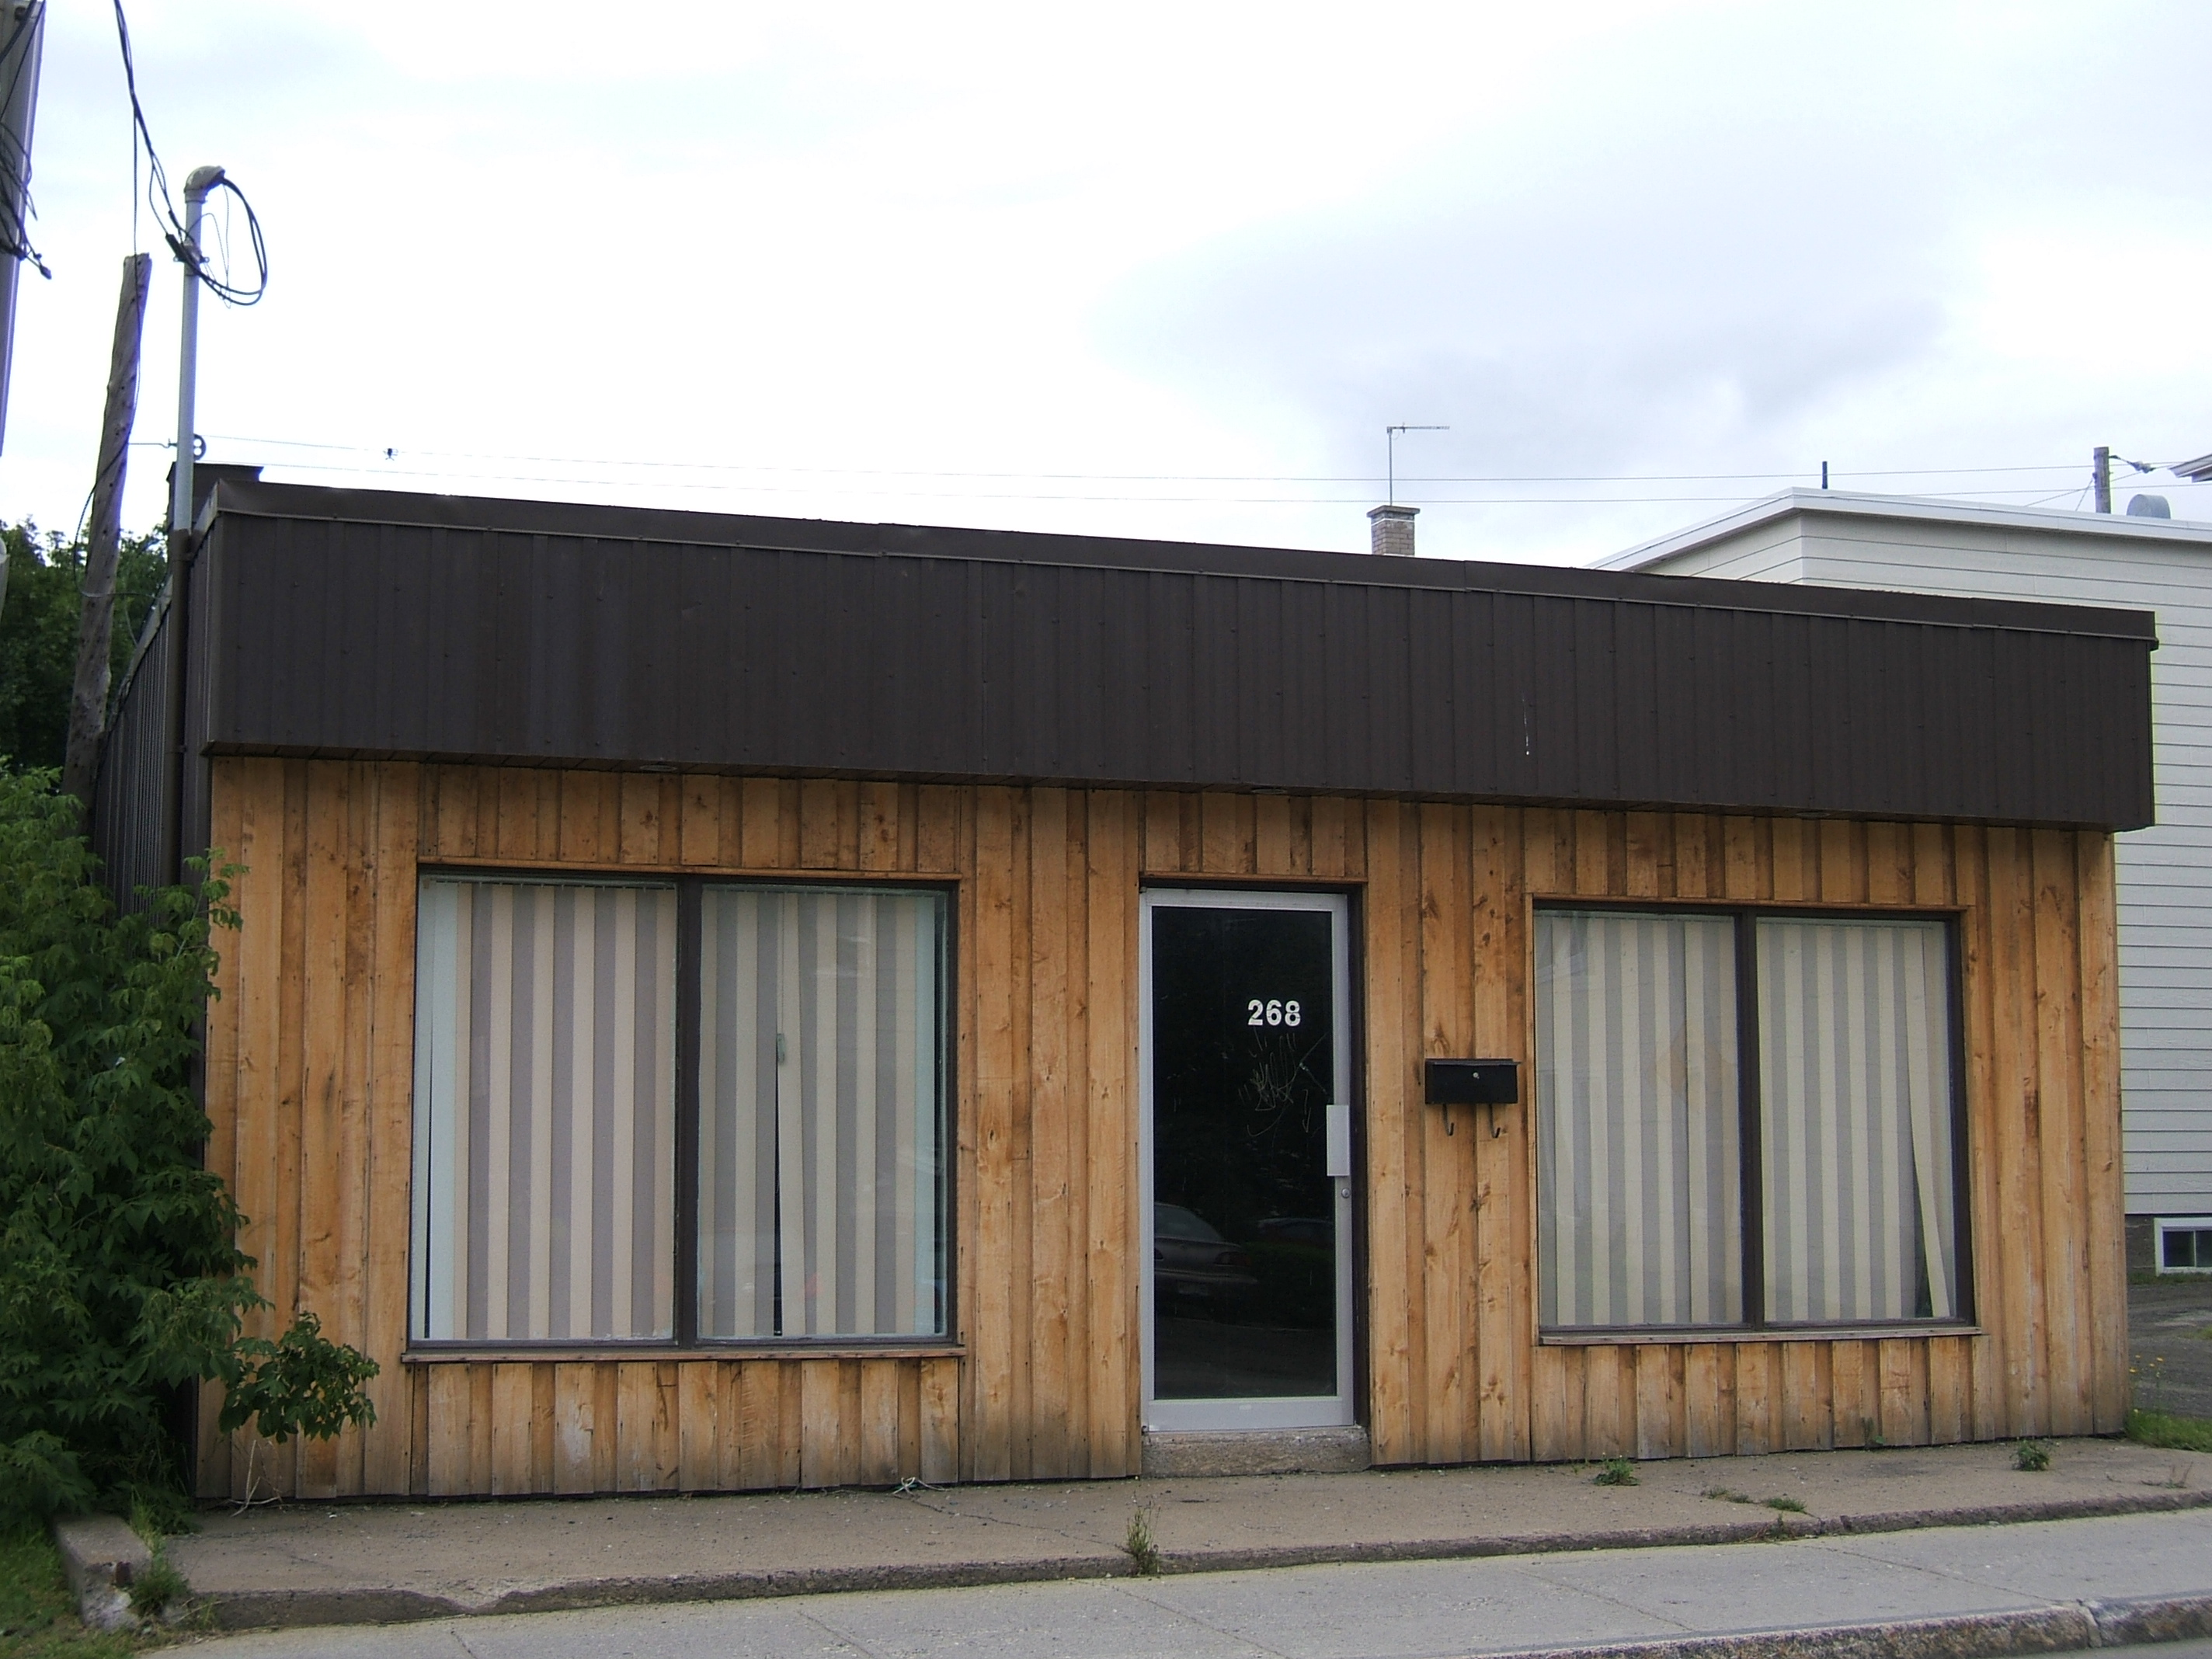 1189 - 268, avenue Rouleau